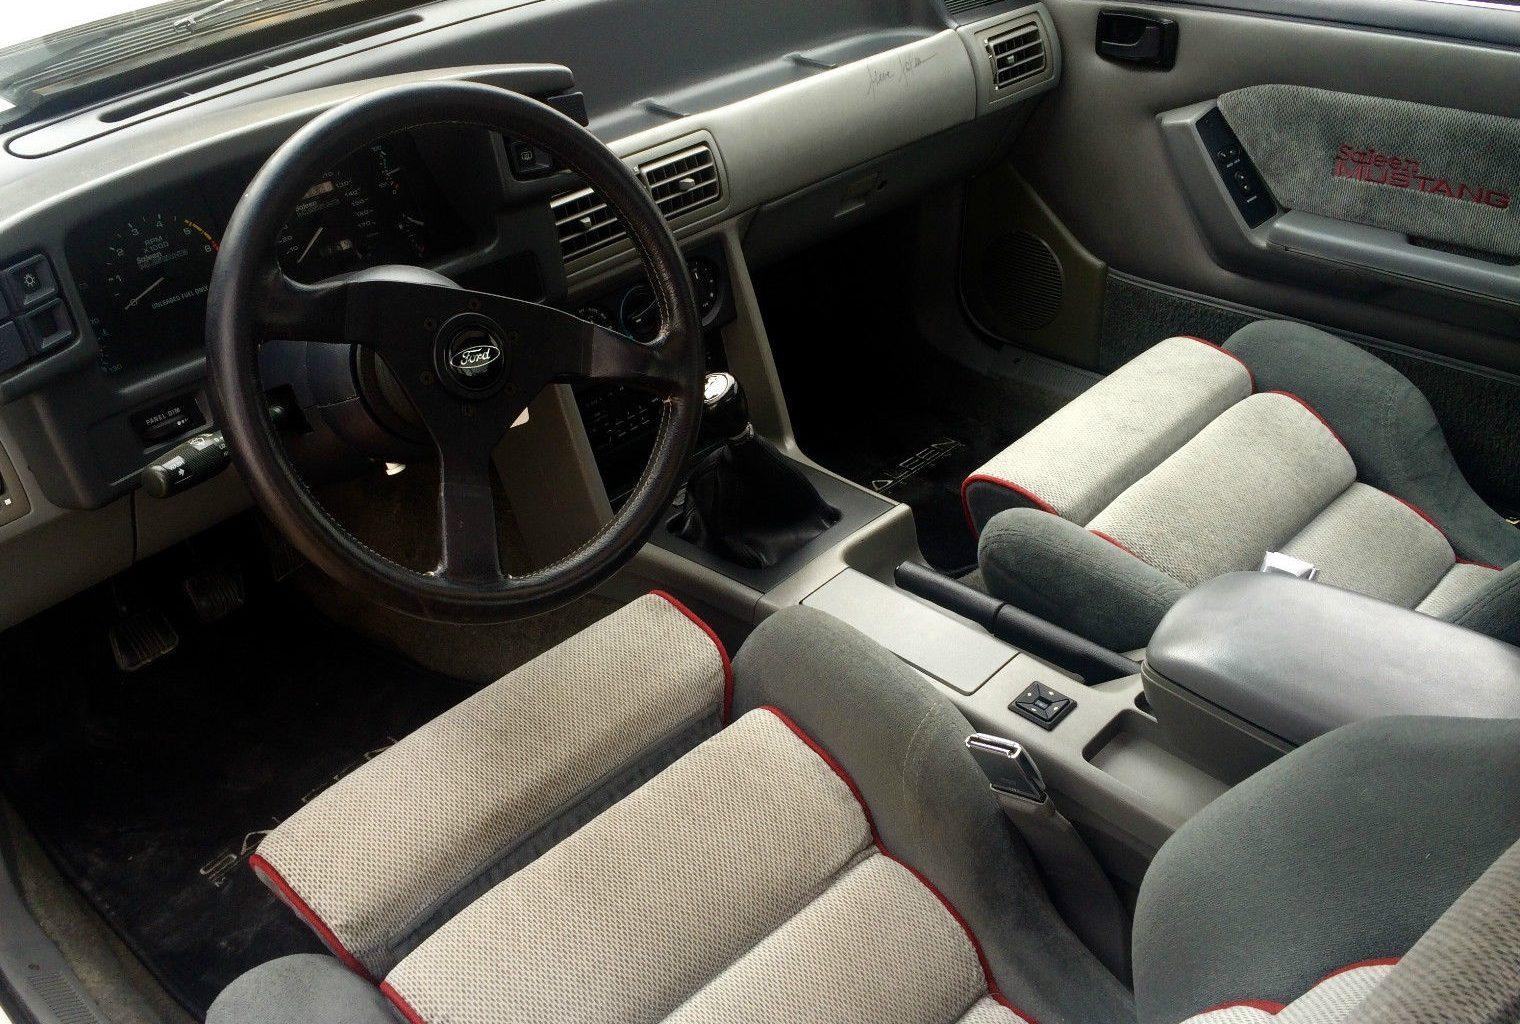 Lotto Winnings: 1988 Ford Mustang Saleen